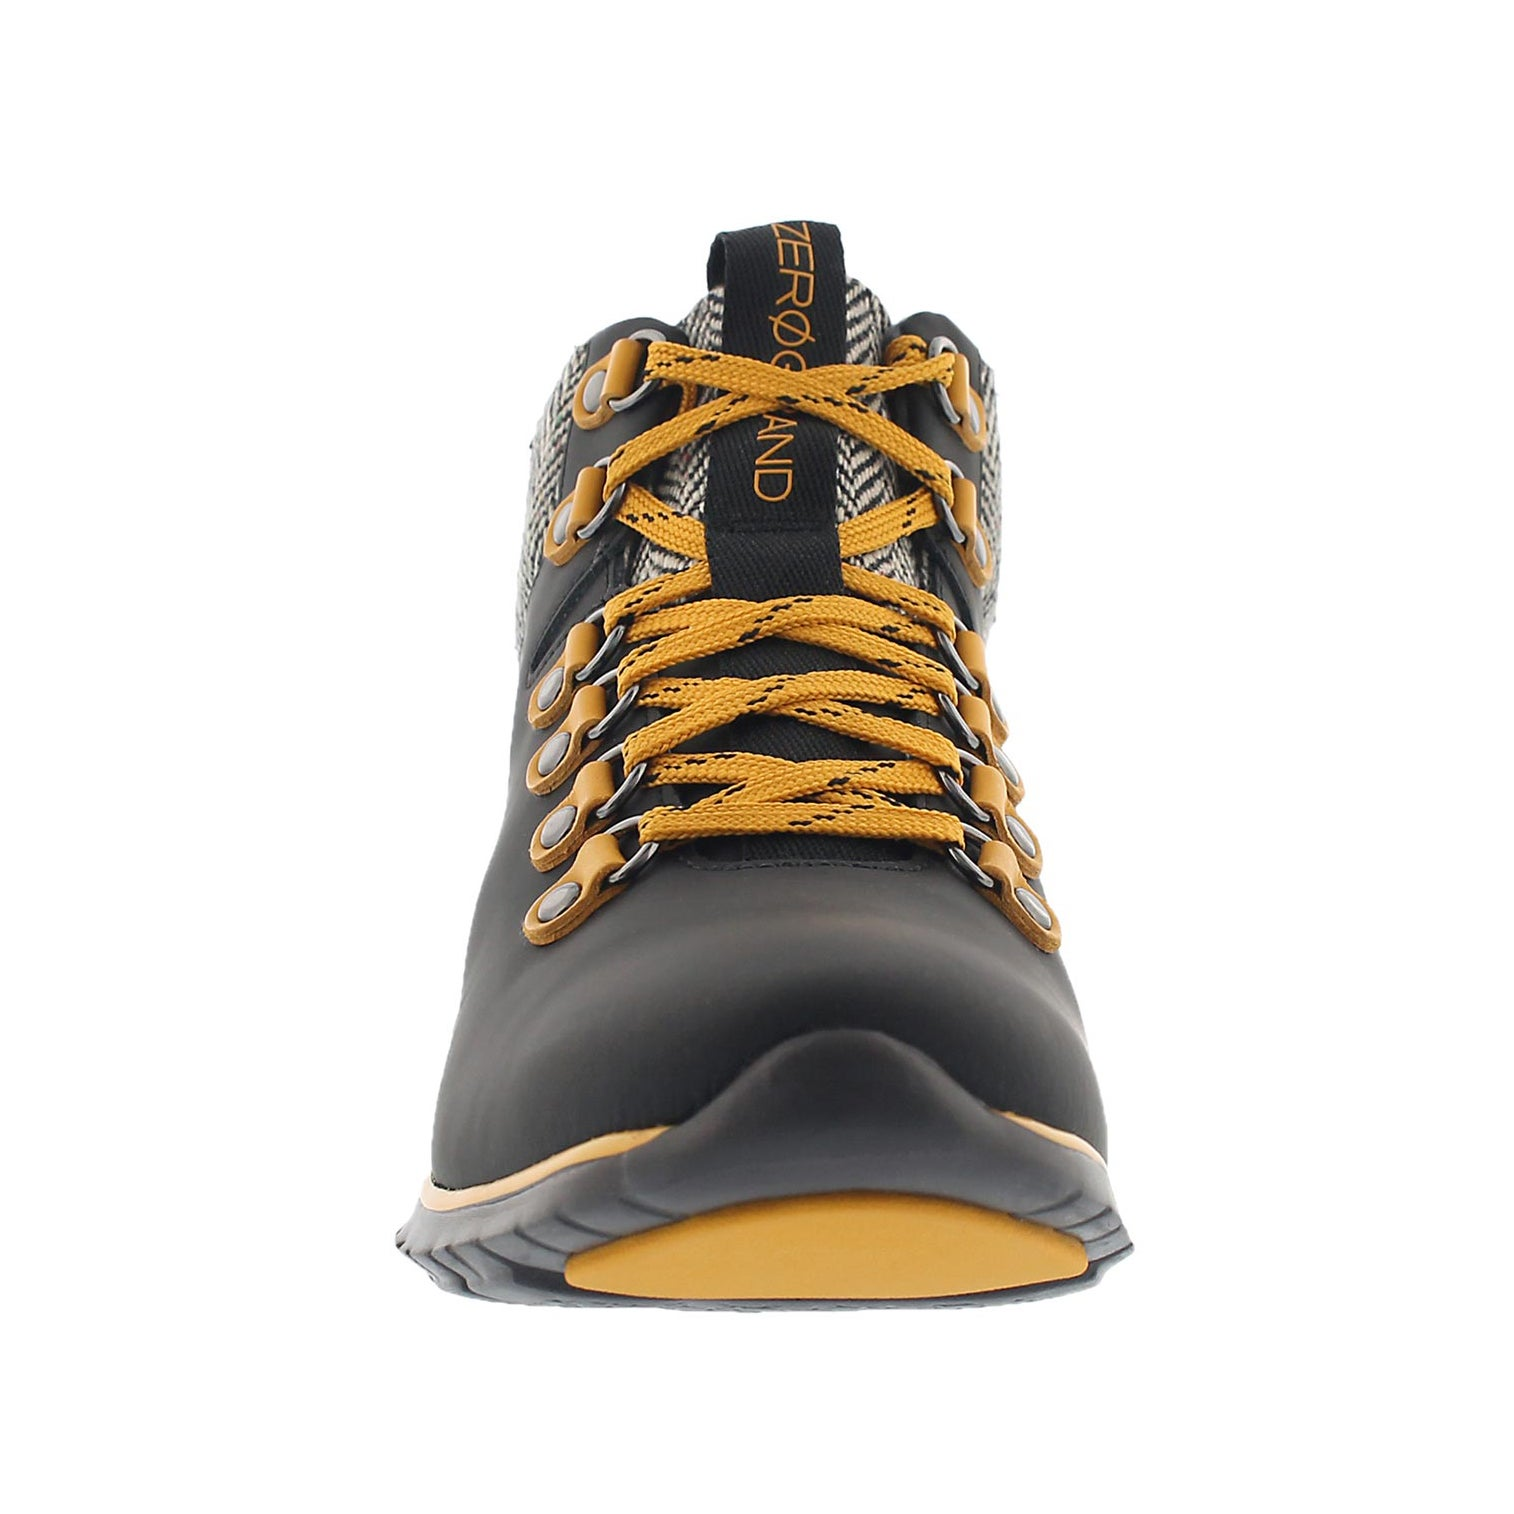 Lds Zerogrand blk/nat wtpf hiking boot